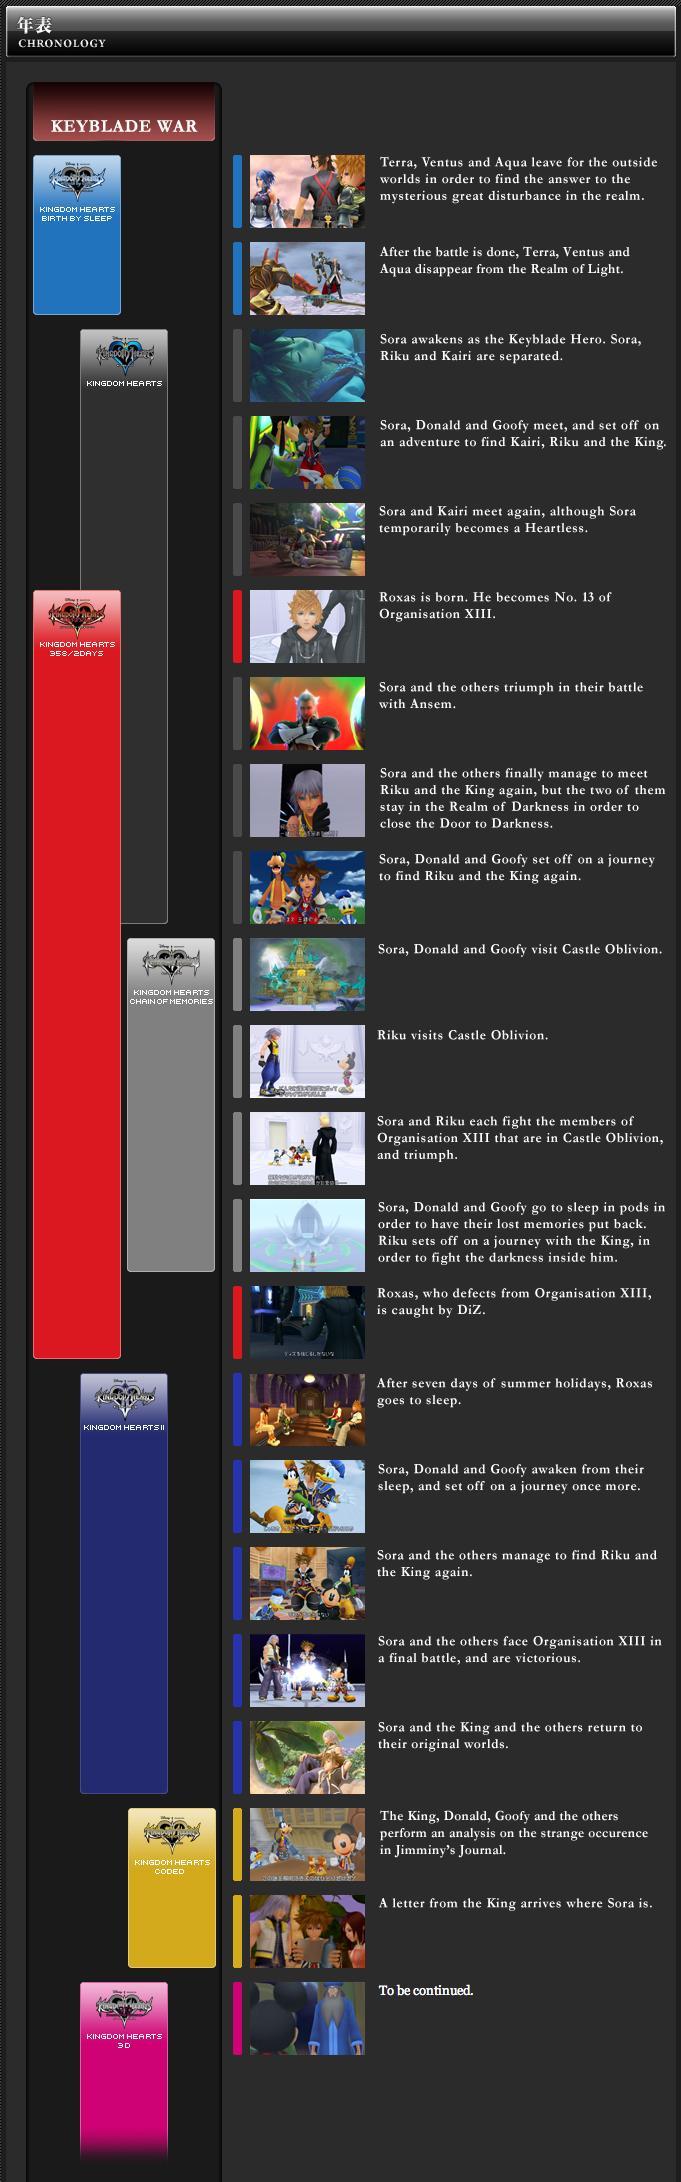 Kingdom Hearts Chronologie